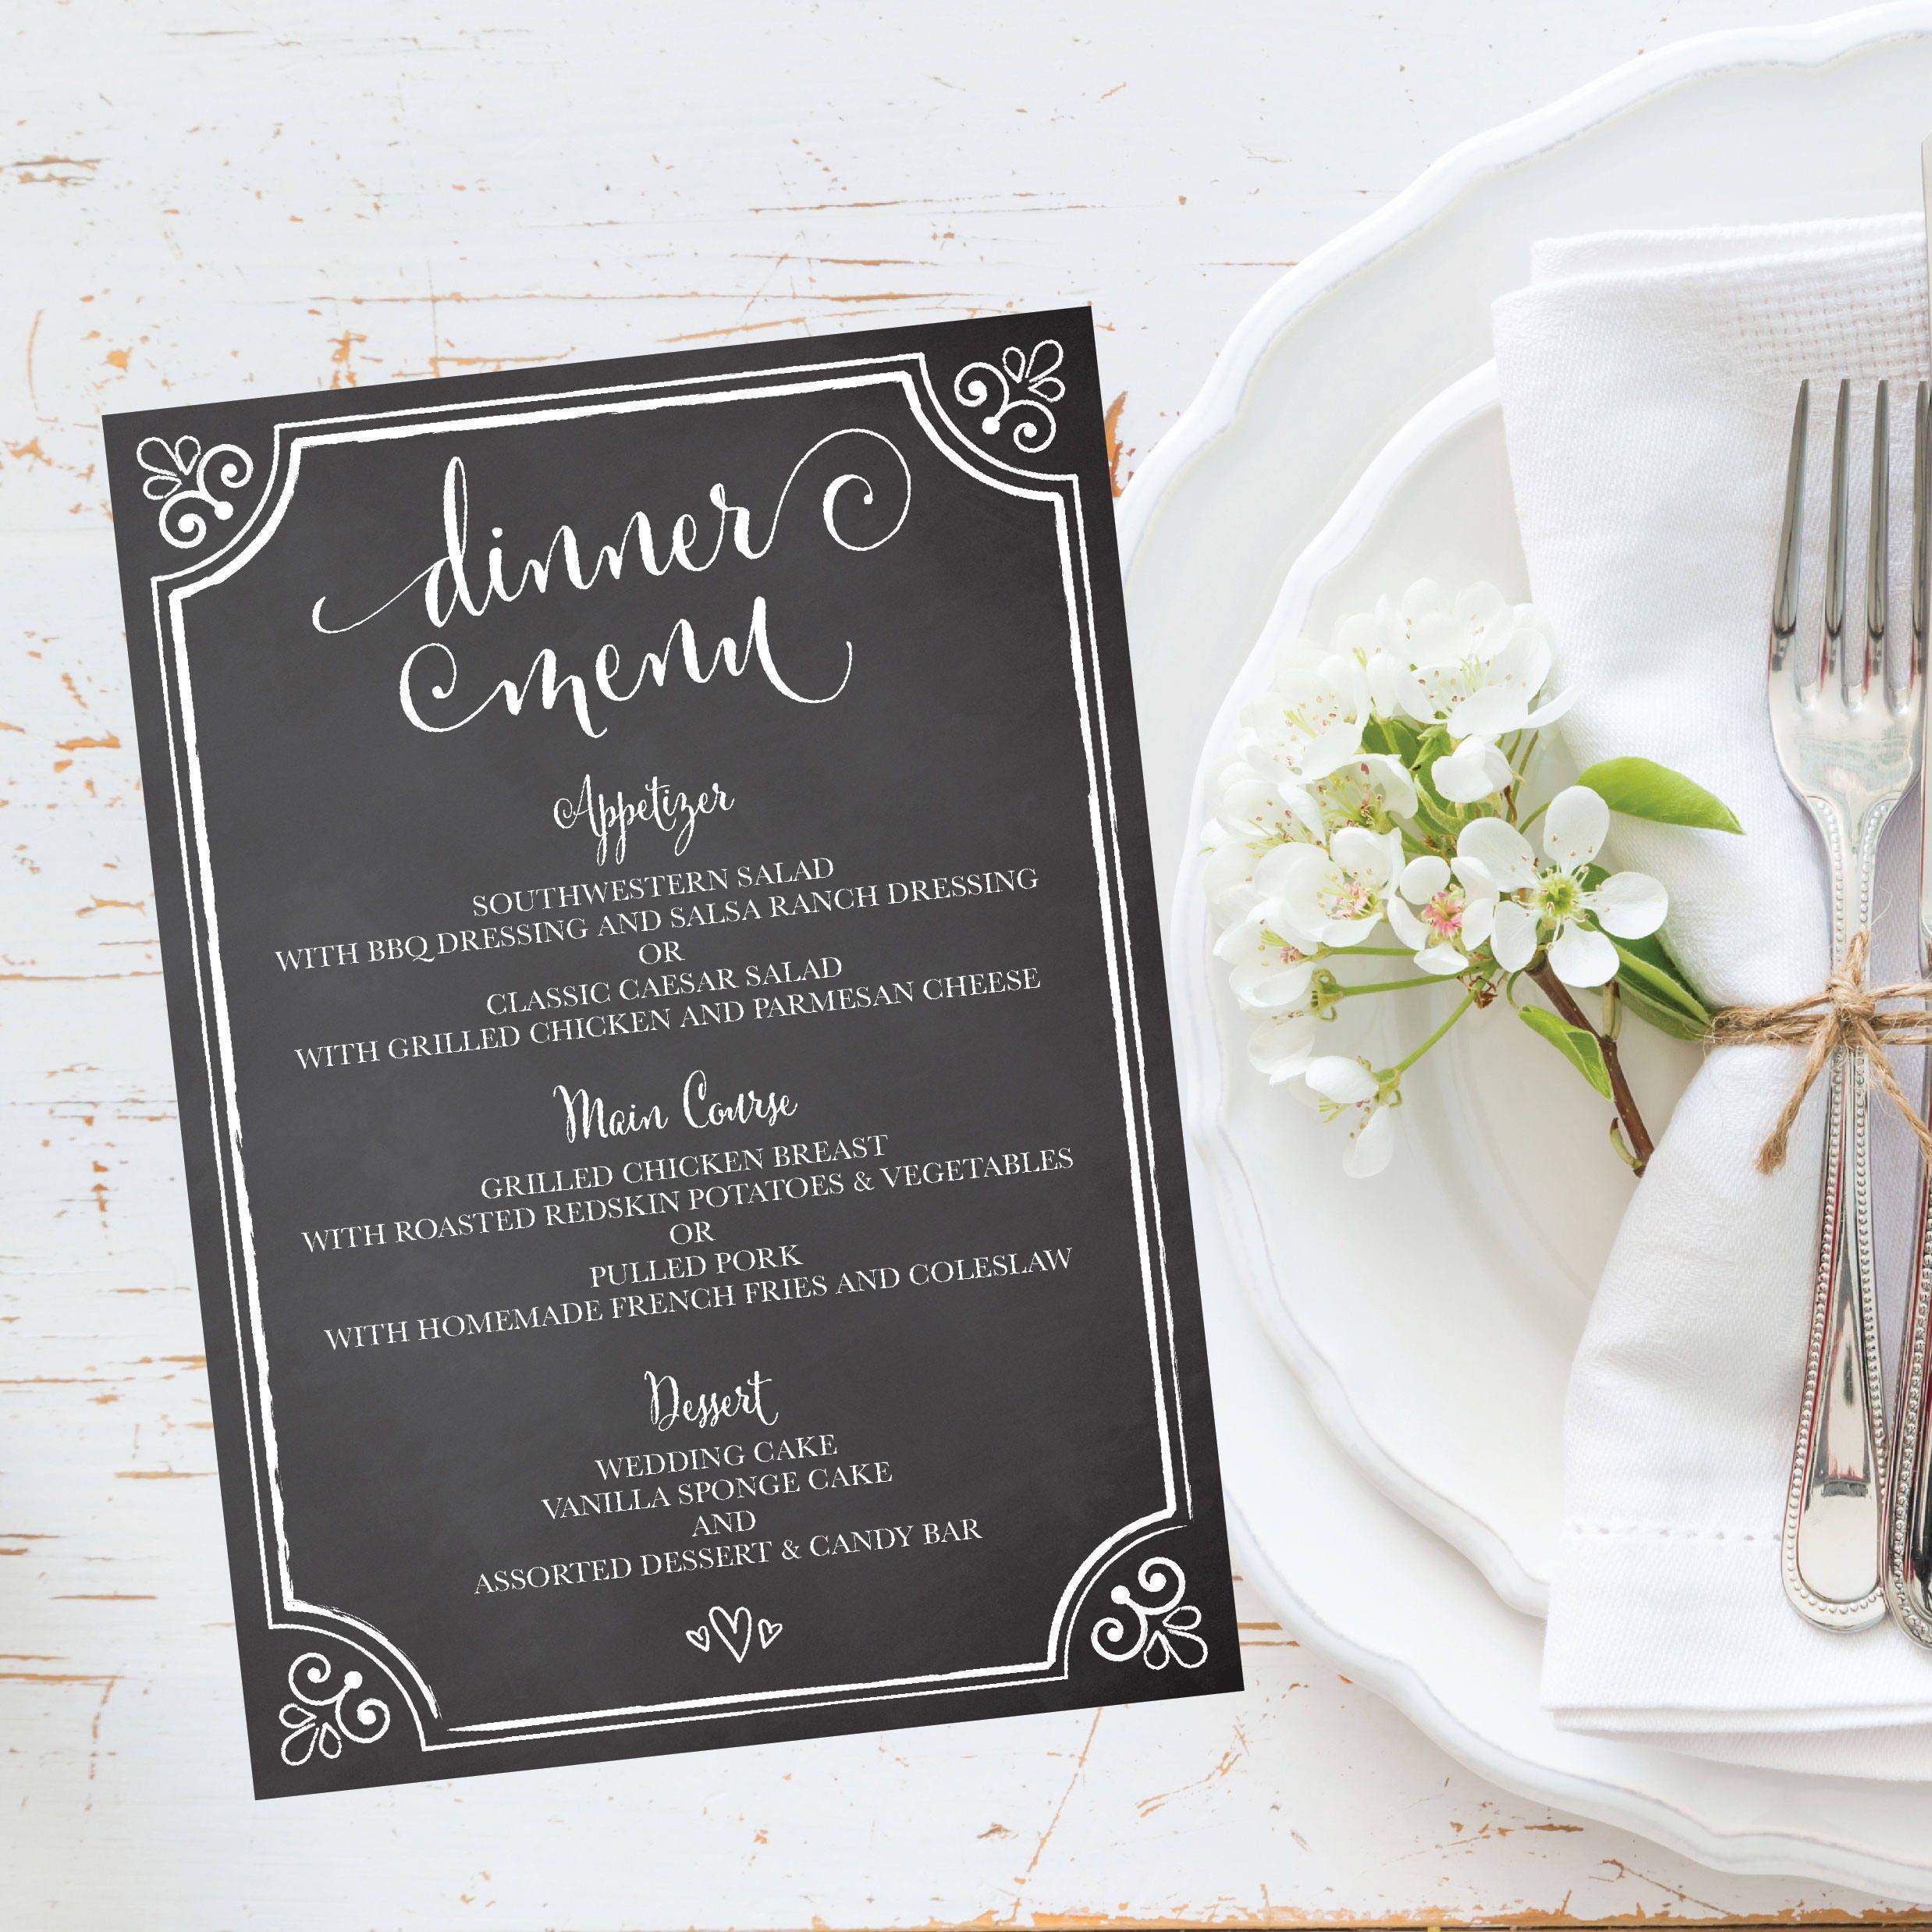 Rustic Chalkboard Wedding Party Menu Template Vintage White Gray 5x7 Editable Printable Dinner